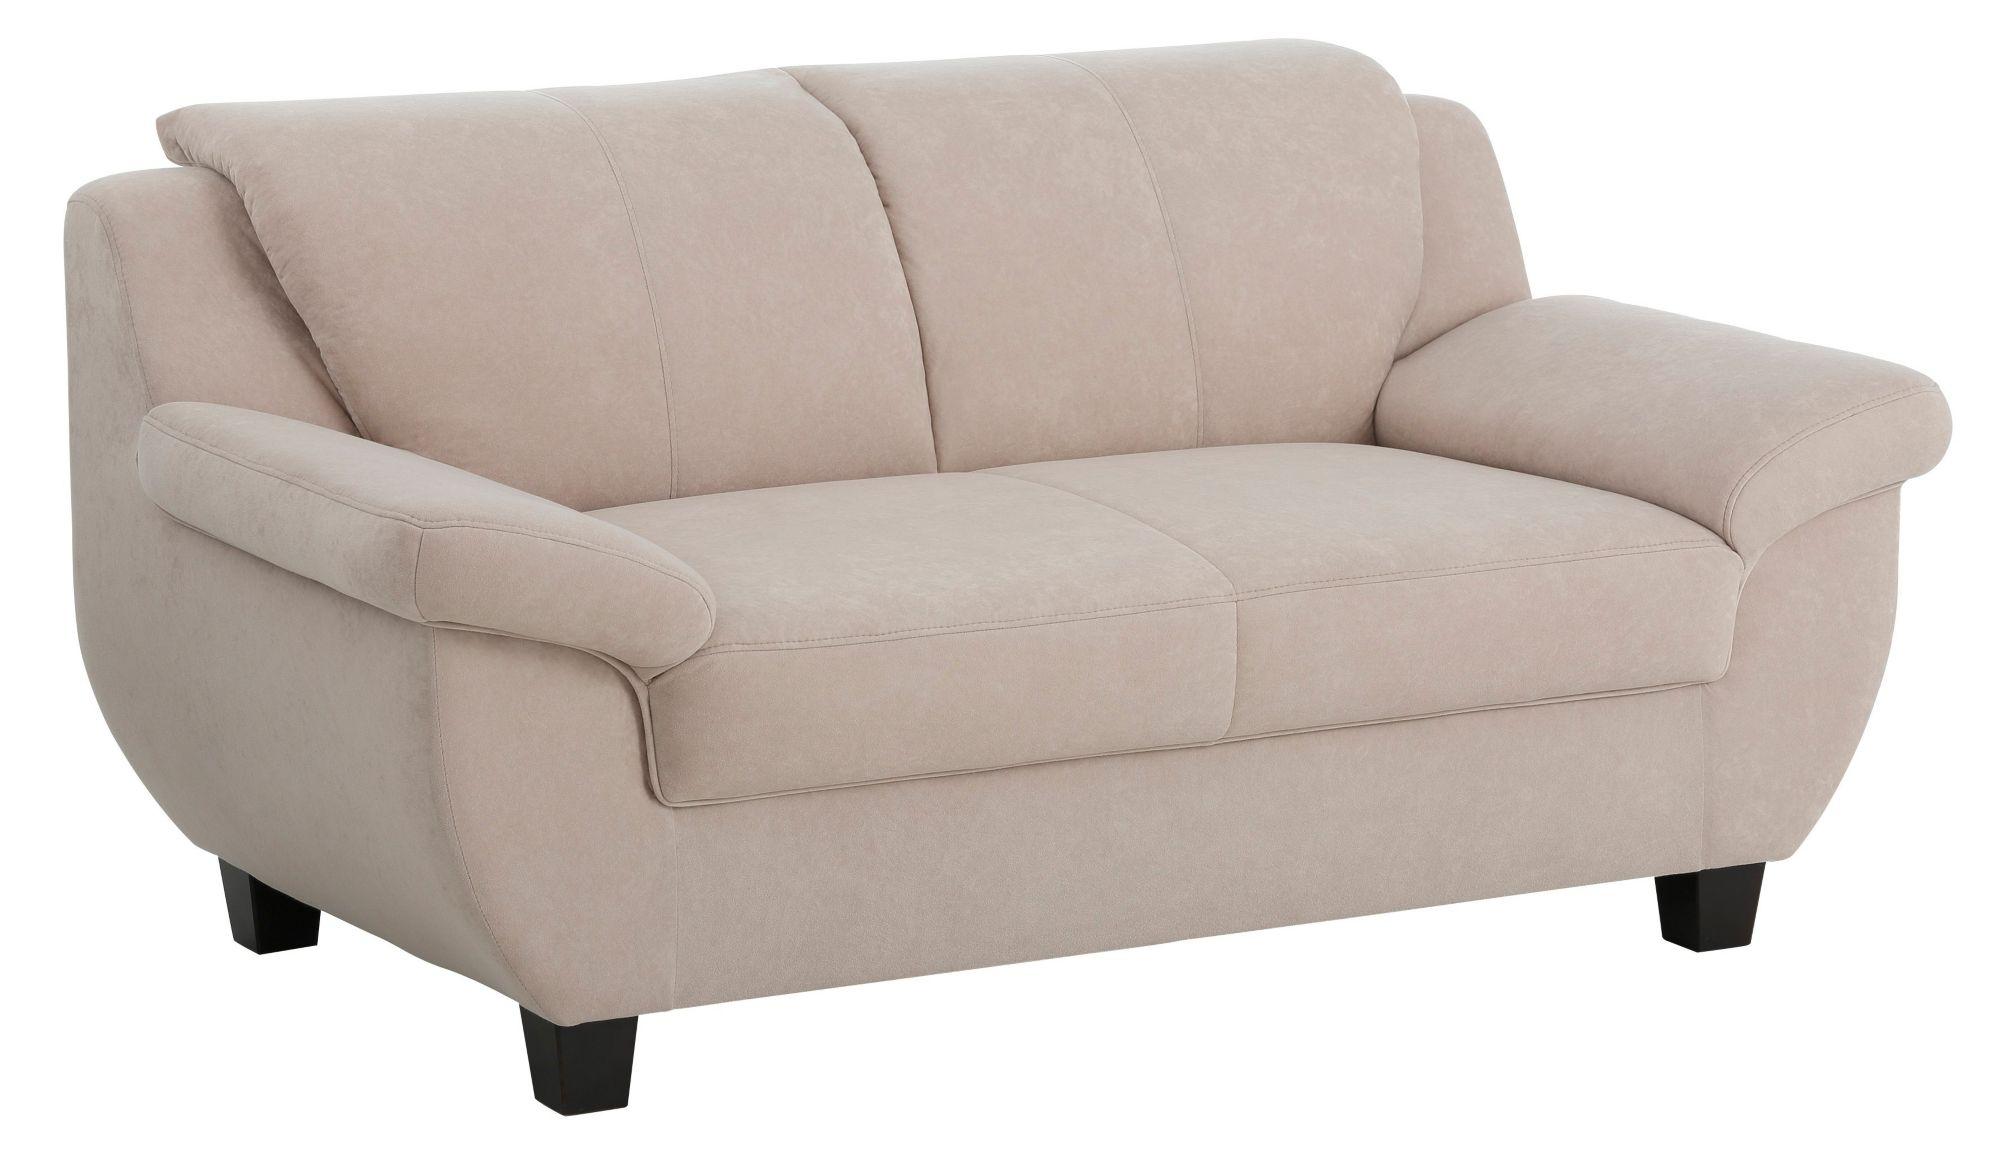 home affaire 2 sitzer yesterday schwab versand. Black Bedroom Furniture Sets. Home Design Ideas